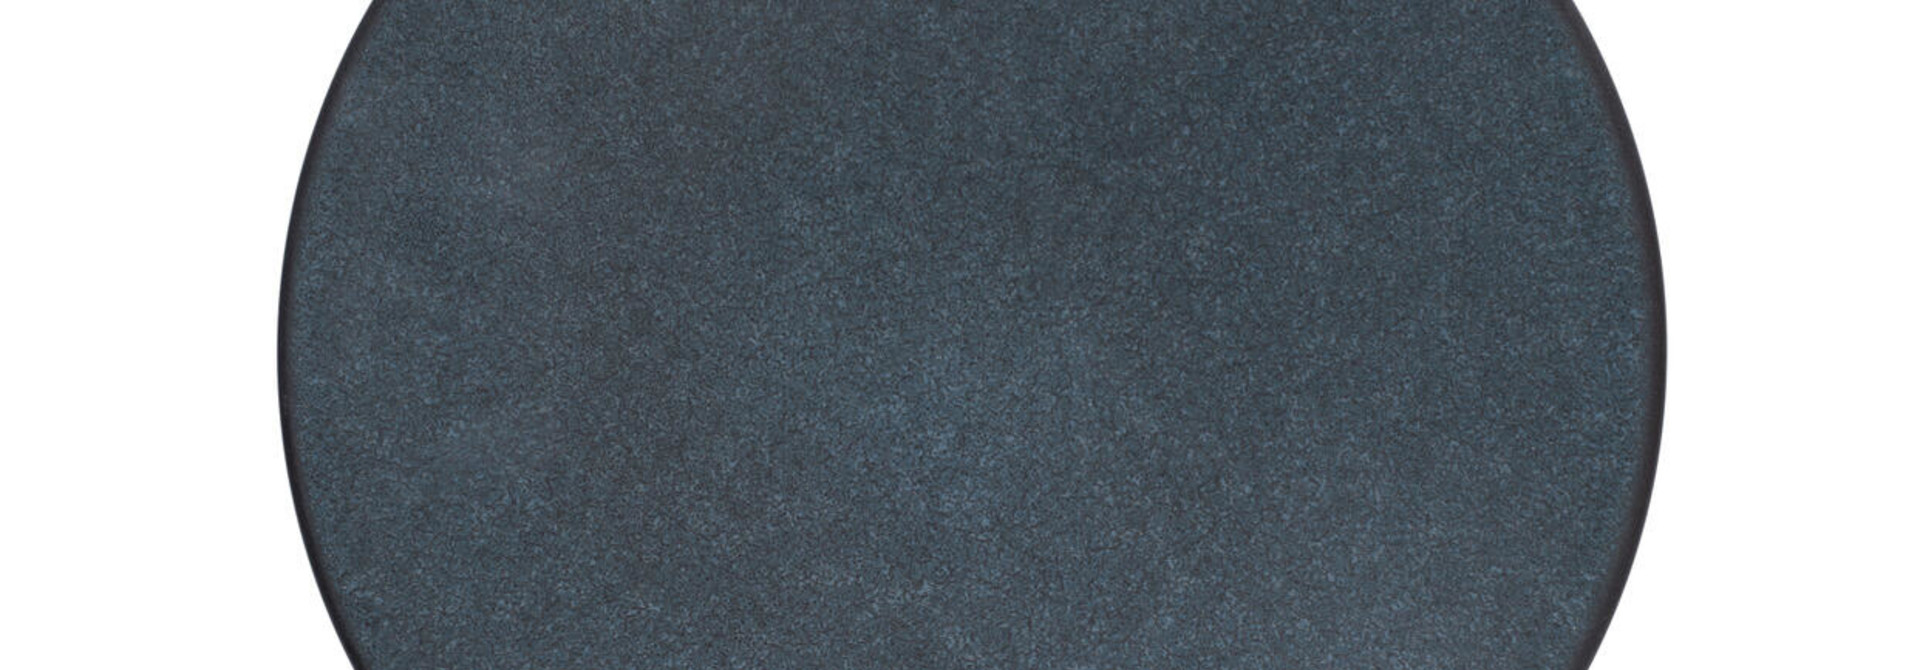 Dinner Plate - Tourron - Ink Blue